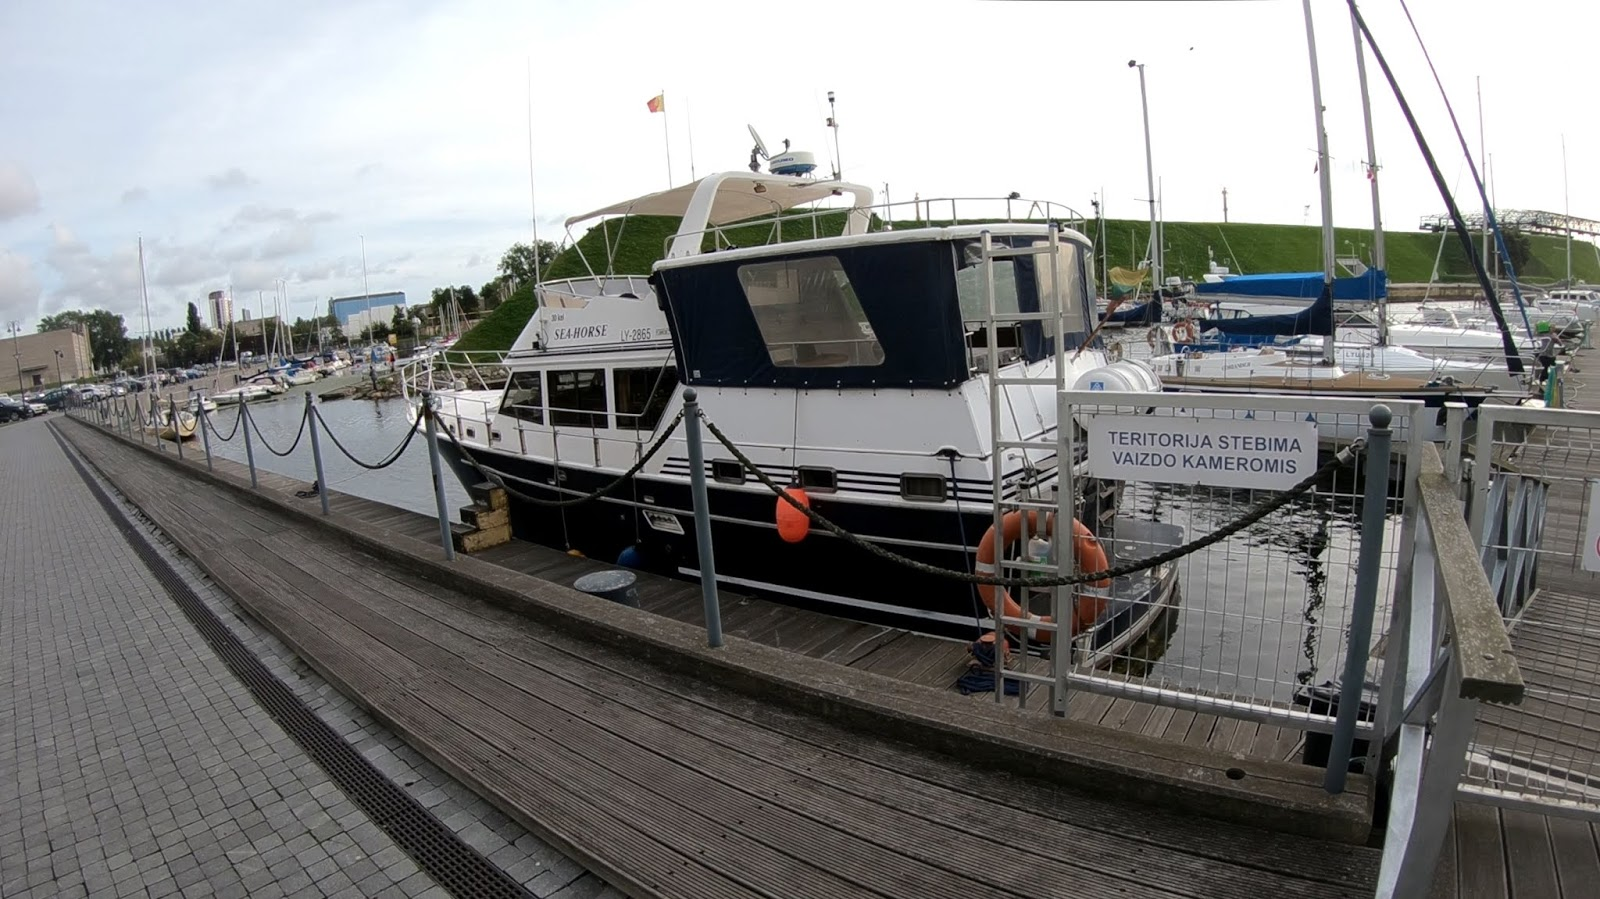 Развлекательная яхта Sea Horse - морская лошадь